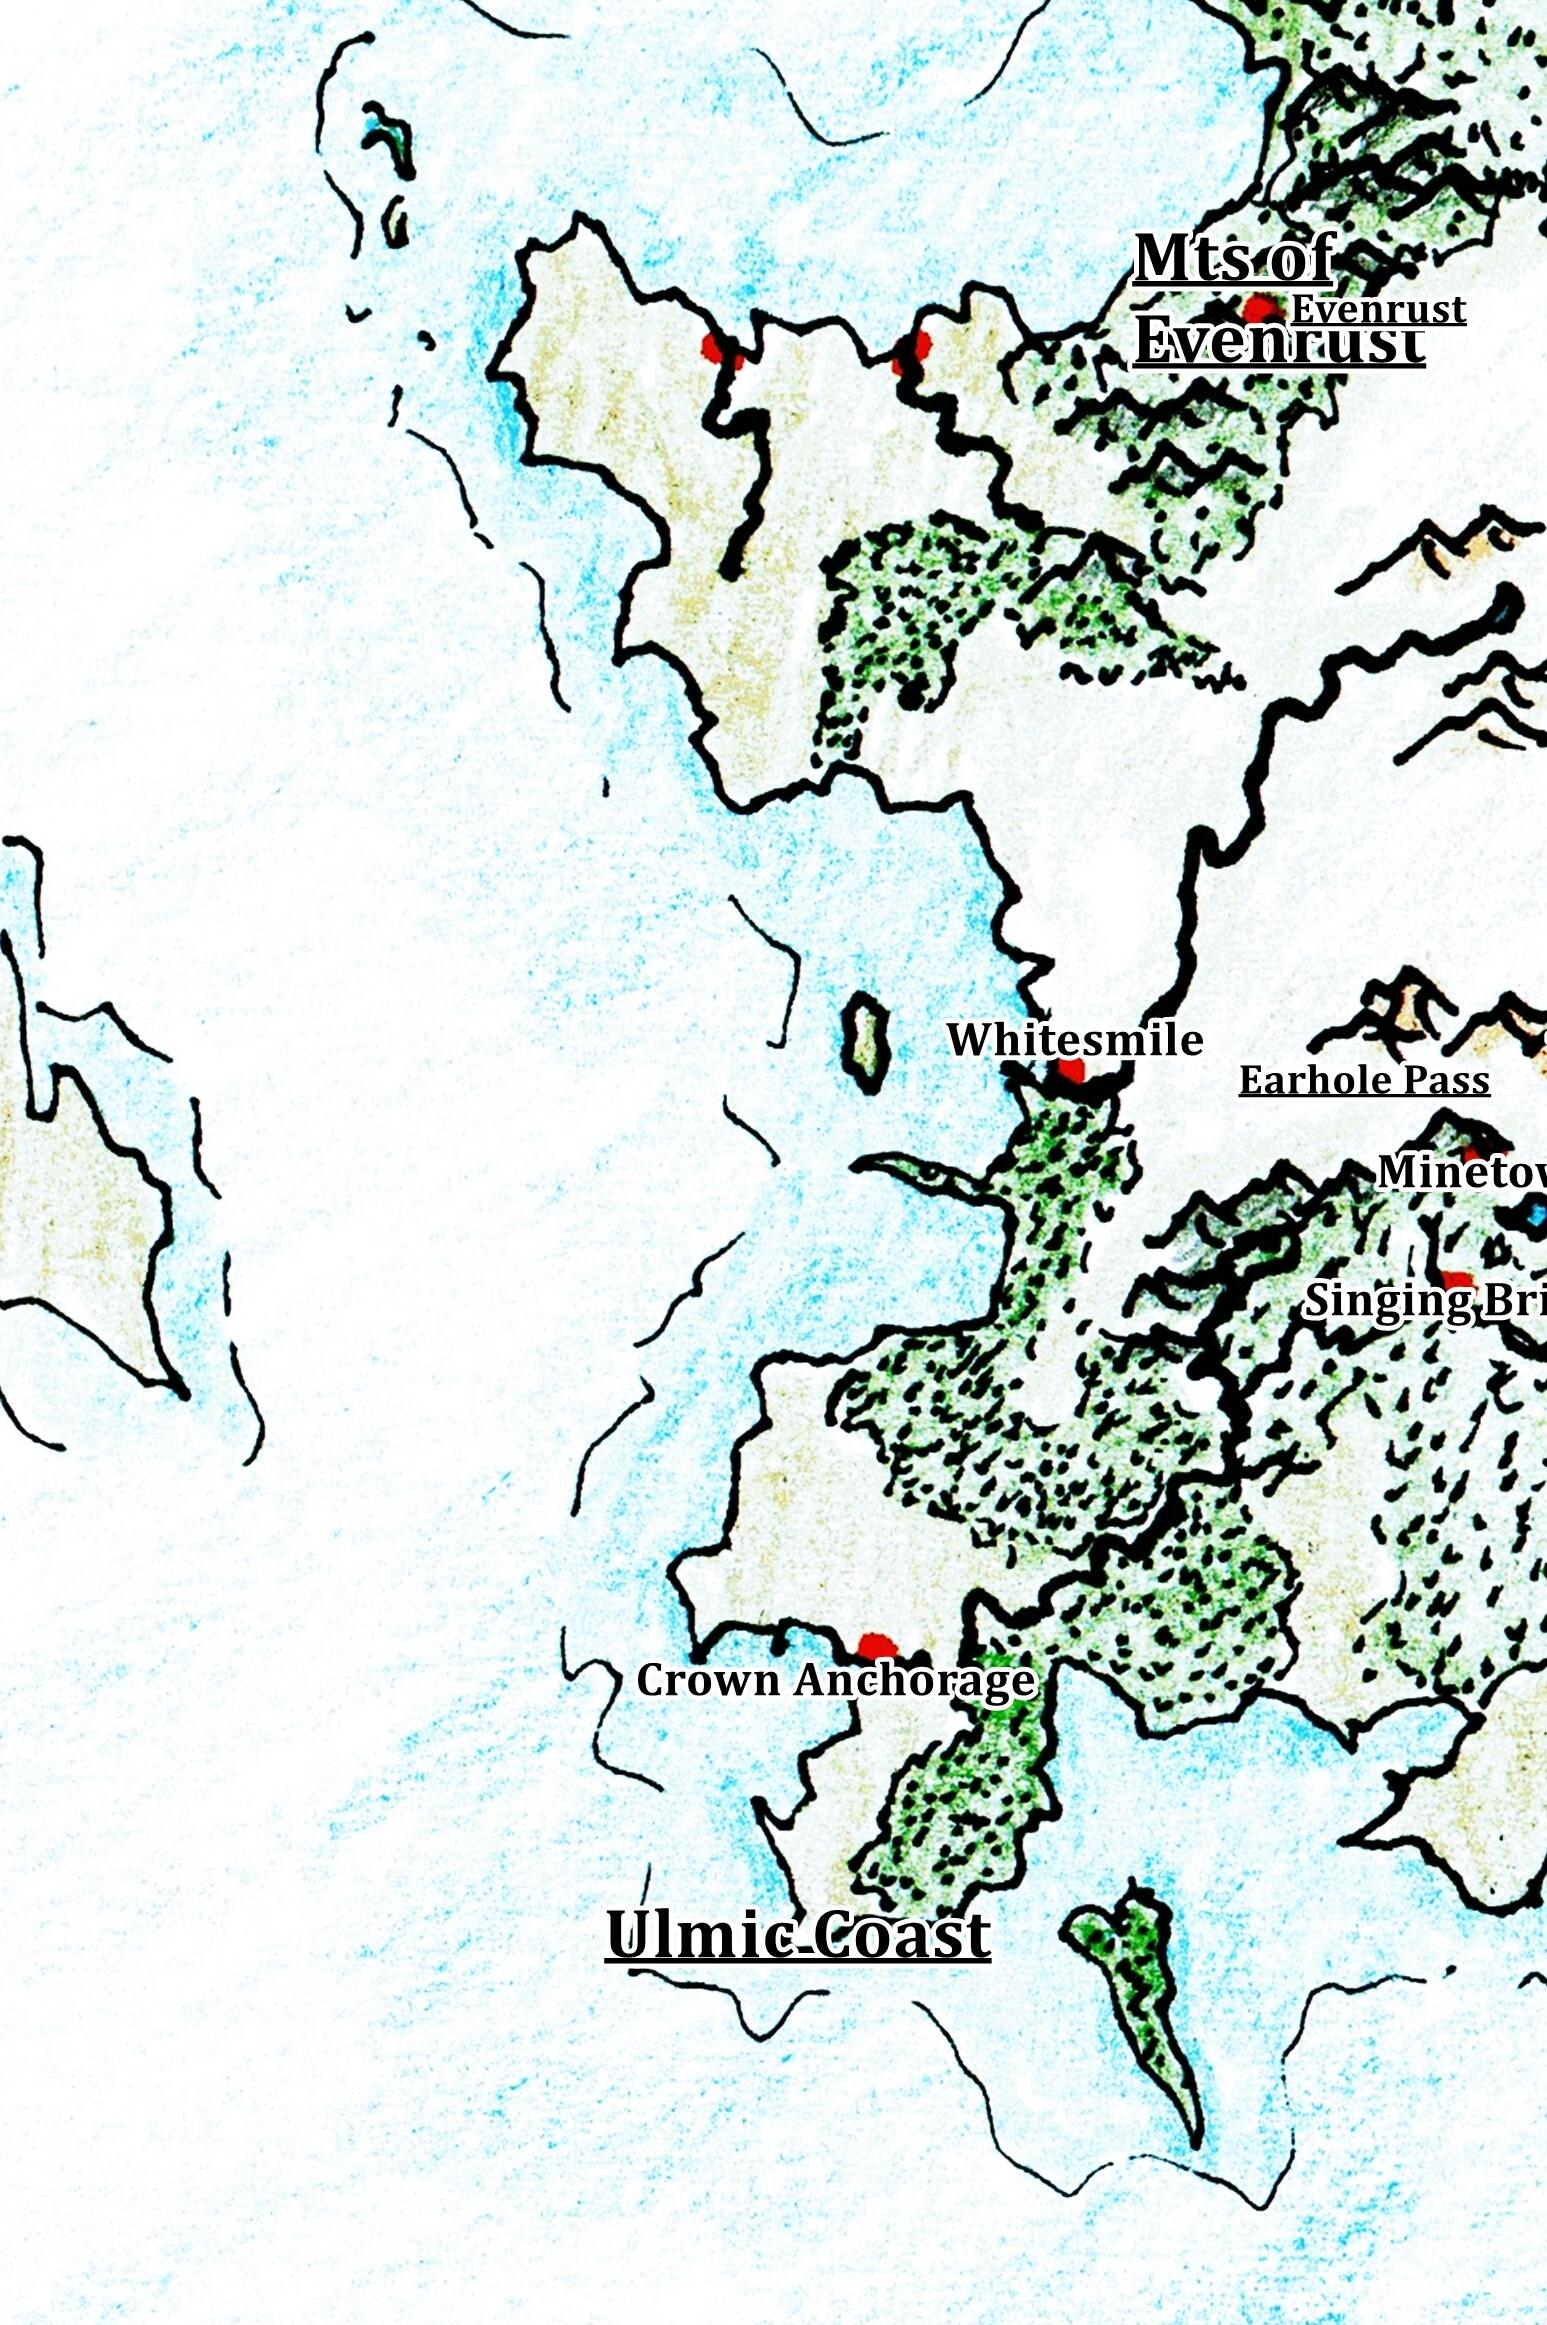 Crown Anchorage